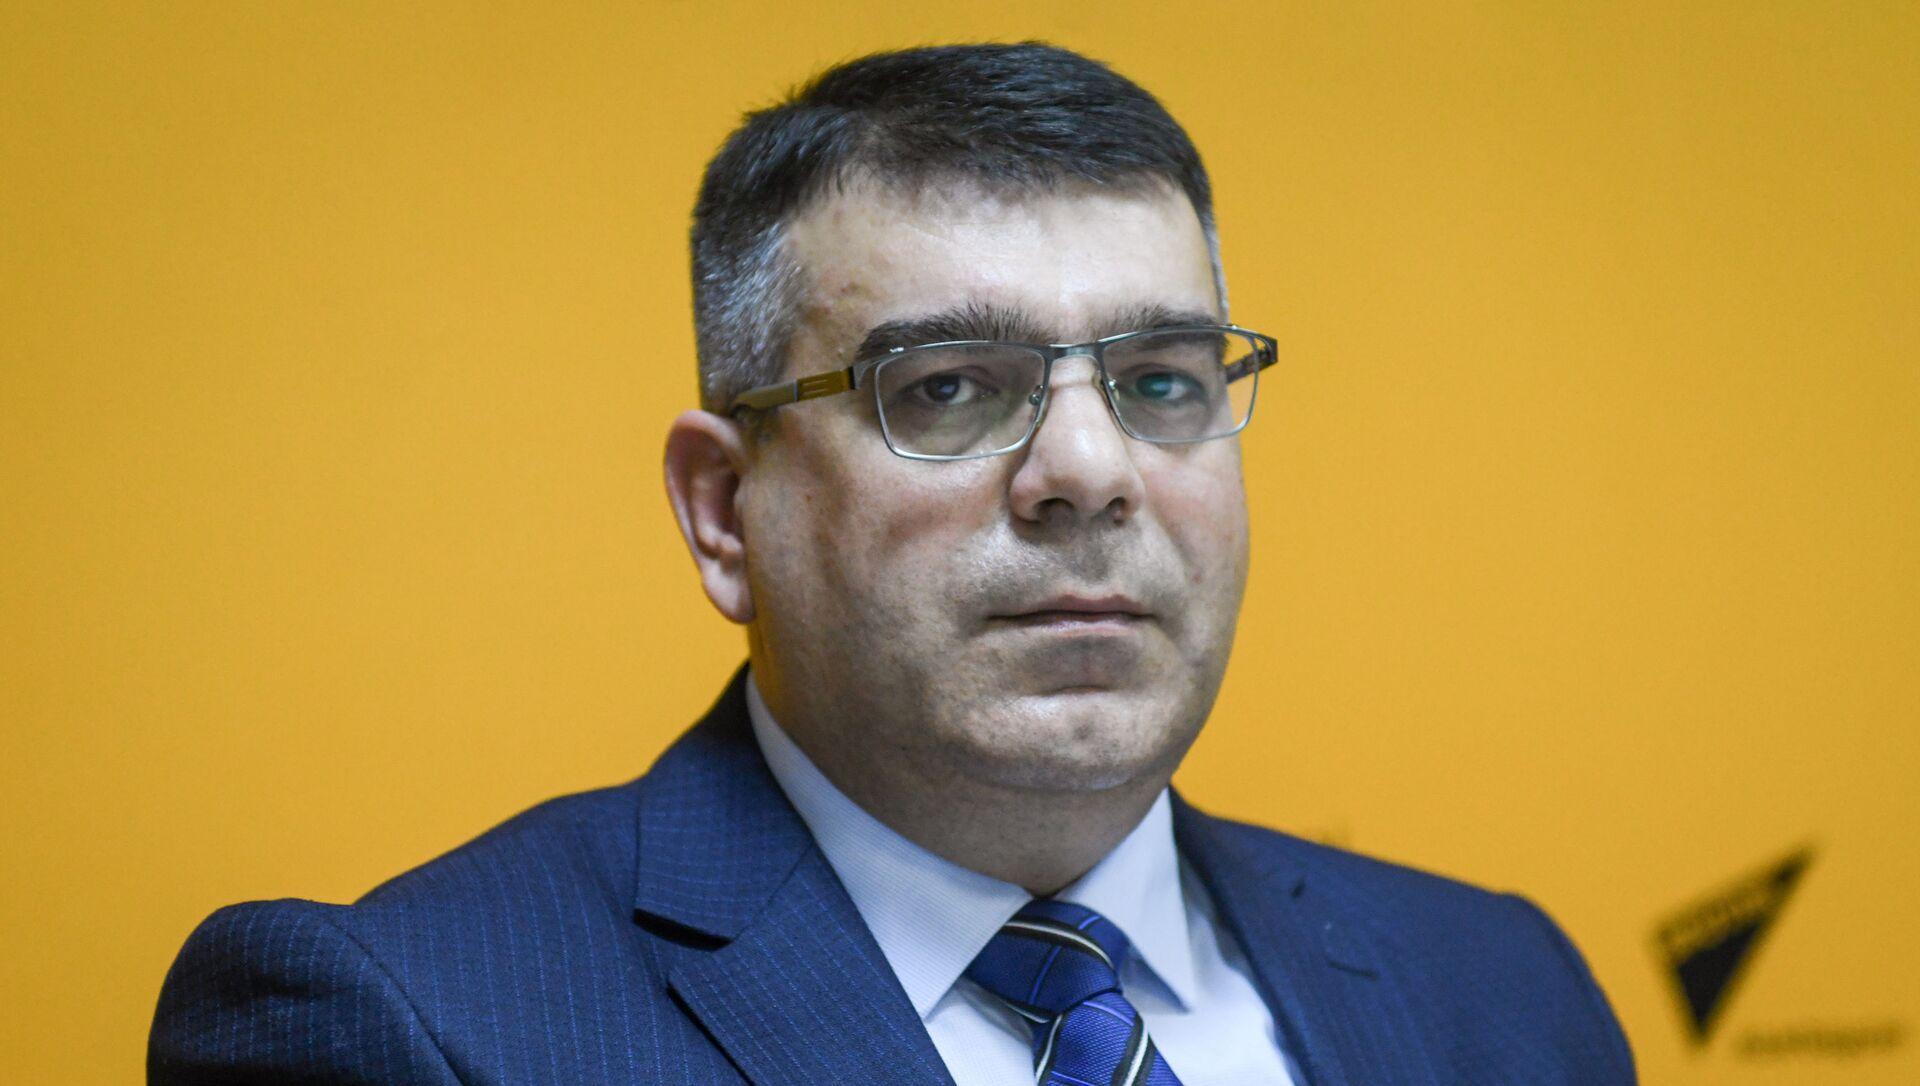 Эксперт в области недвижимого имущества, экономист Эльнур Фарзалиев - Sputnik Азербайджан, 1920, 01.09.2021